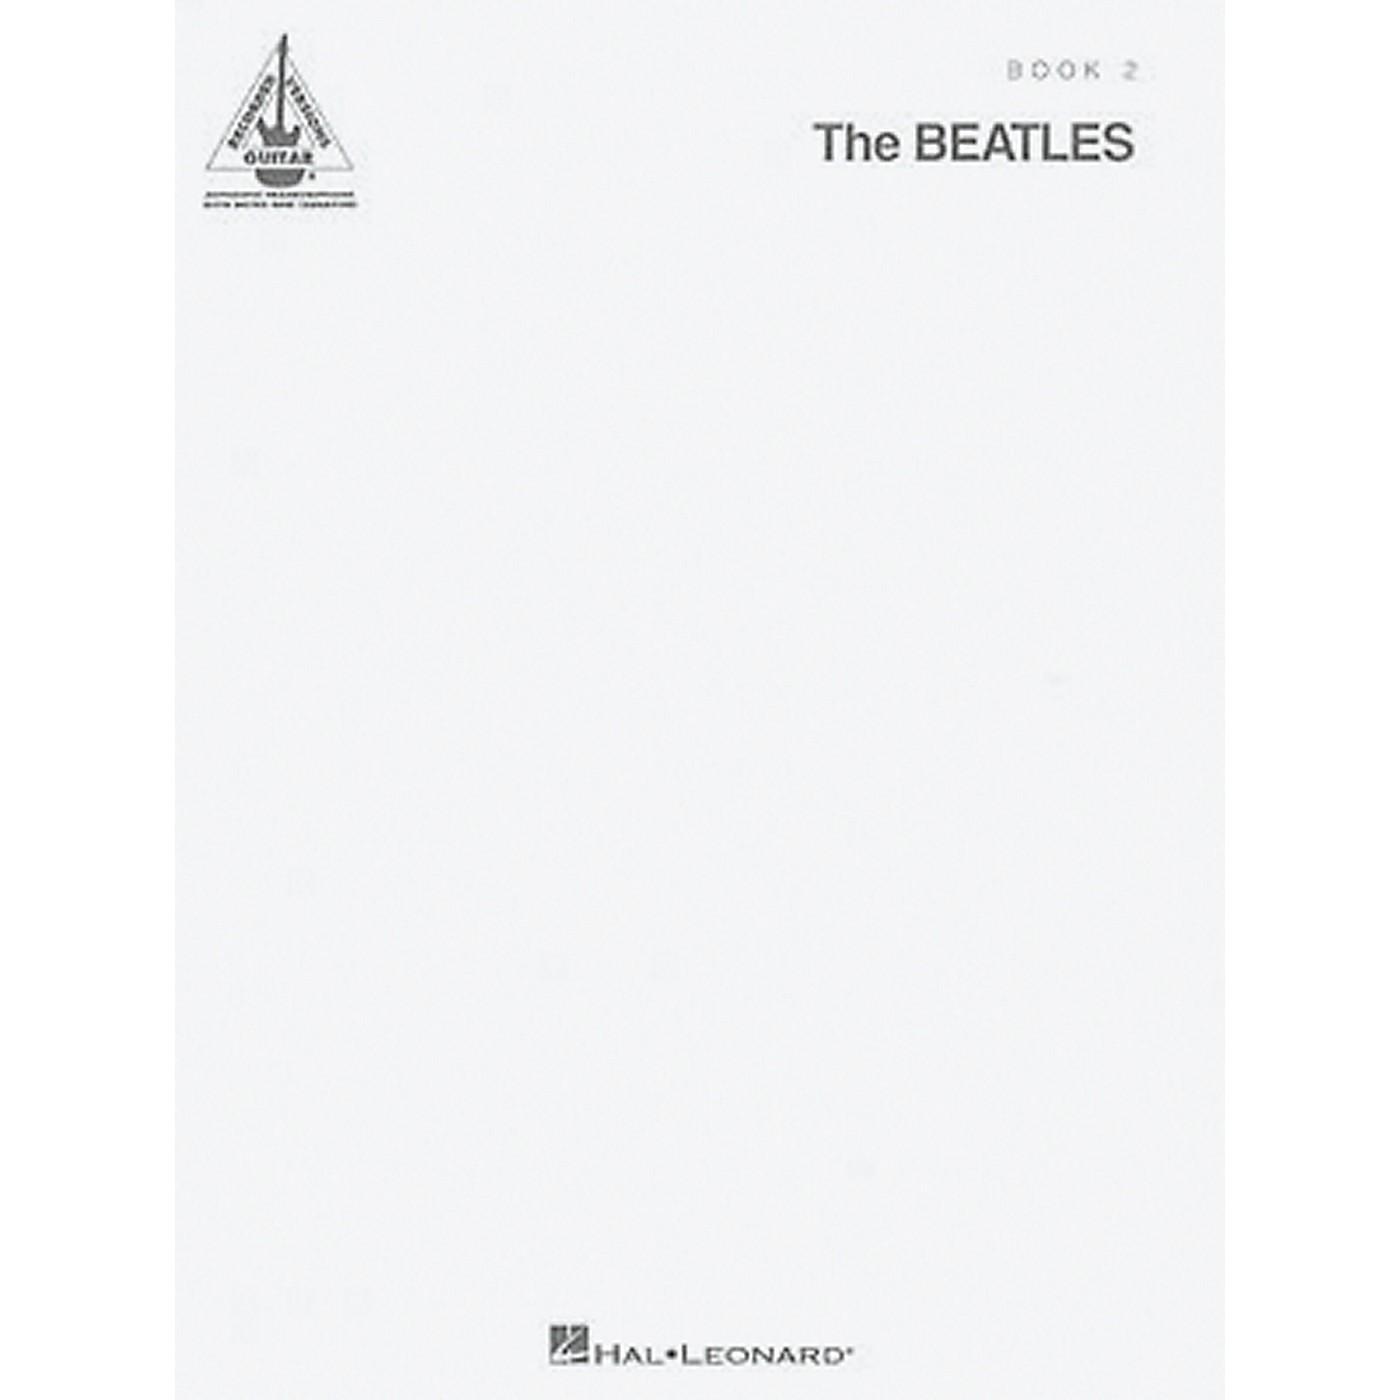 Hal Leonard The Beatles - The White Album Guitar Tab Songbook 2 thumbnail